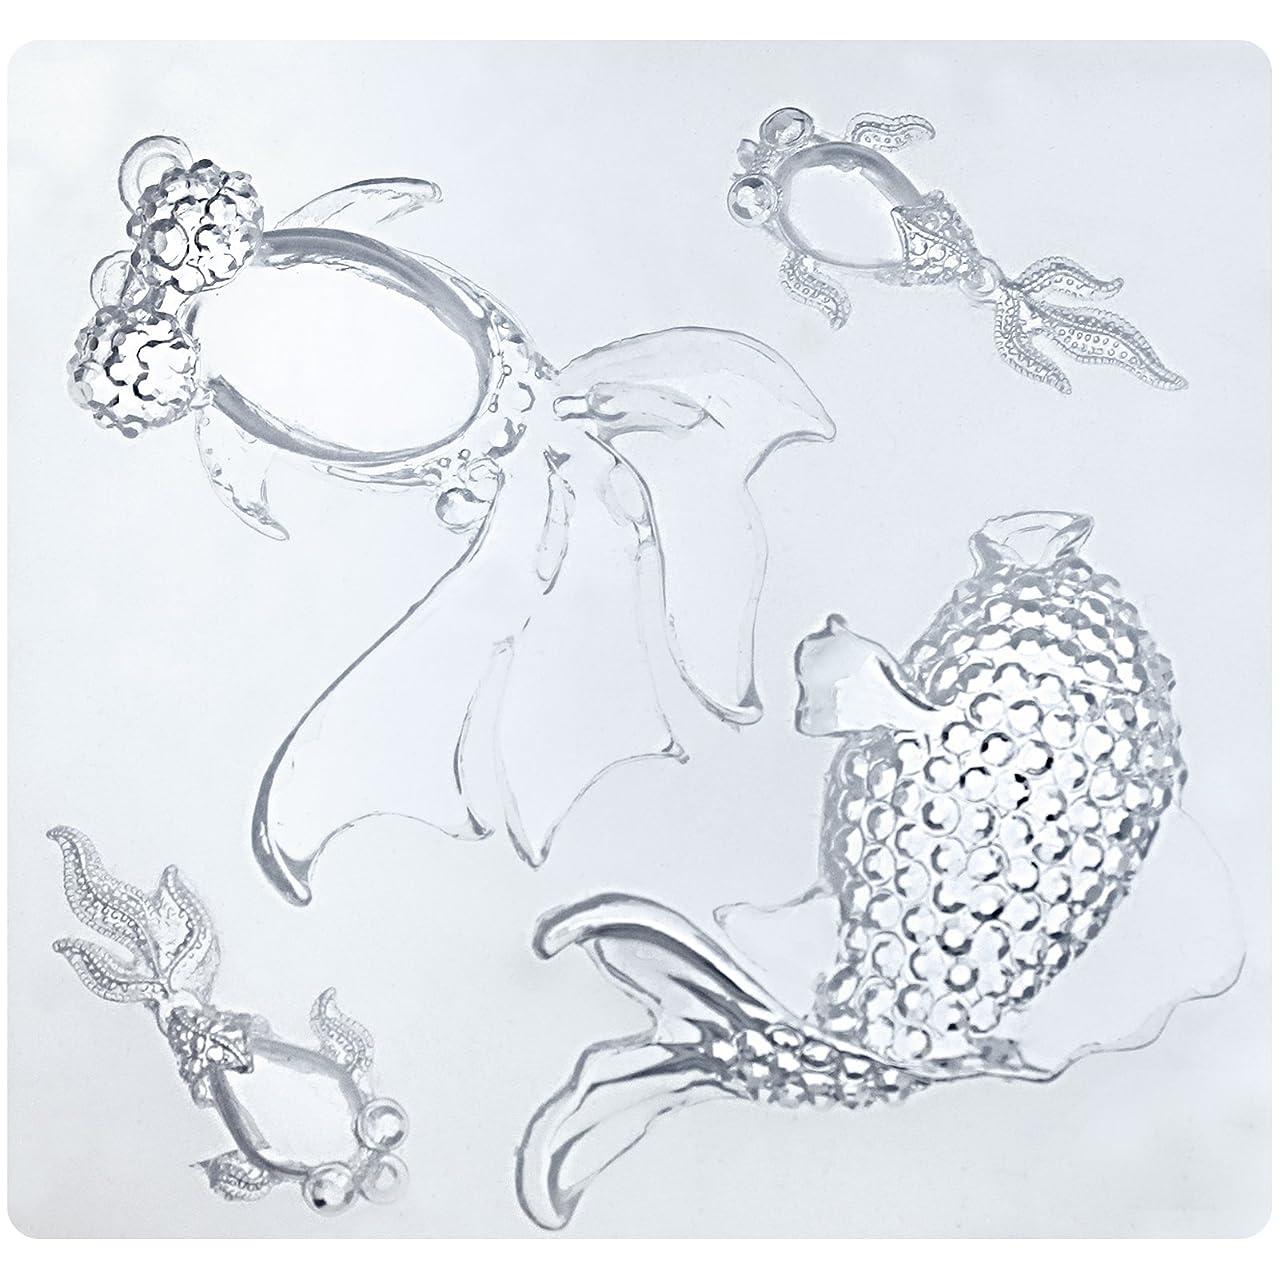 Funshowcase Crystal Goldfish Koi Fish Resin Epoxy Silicone Mold for Pendant Keychain Jewelry Crafting Projects